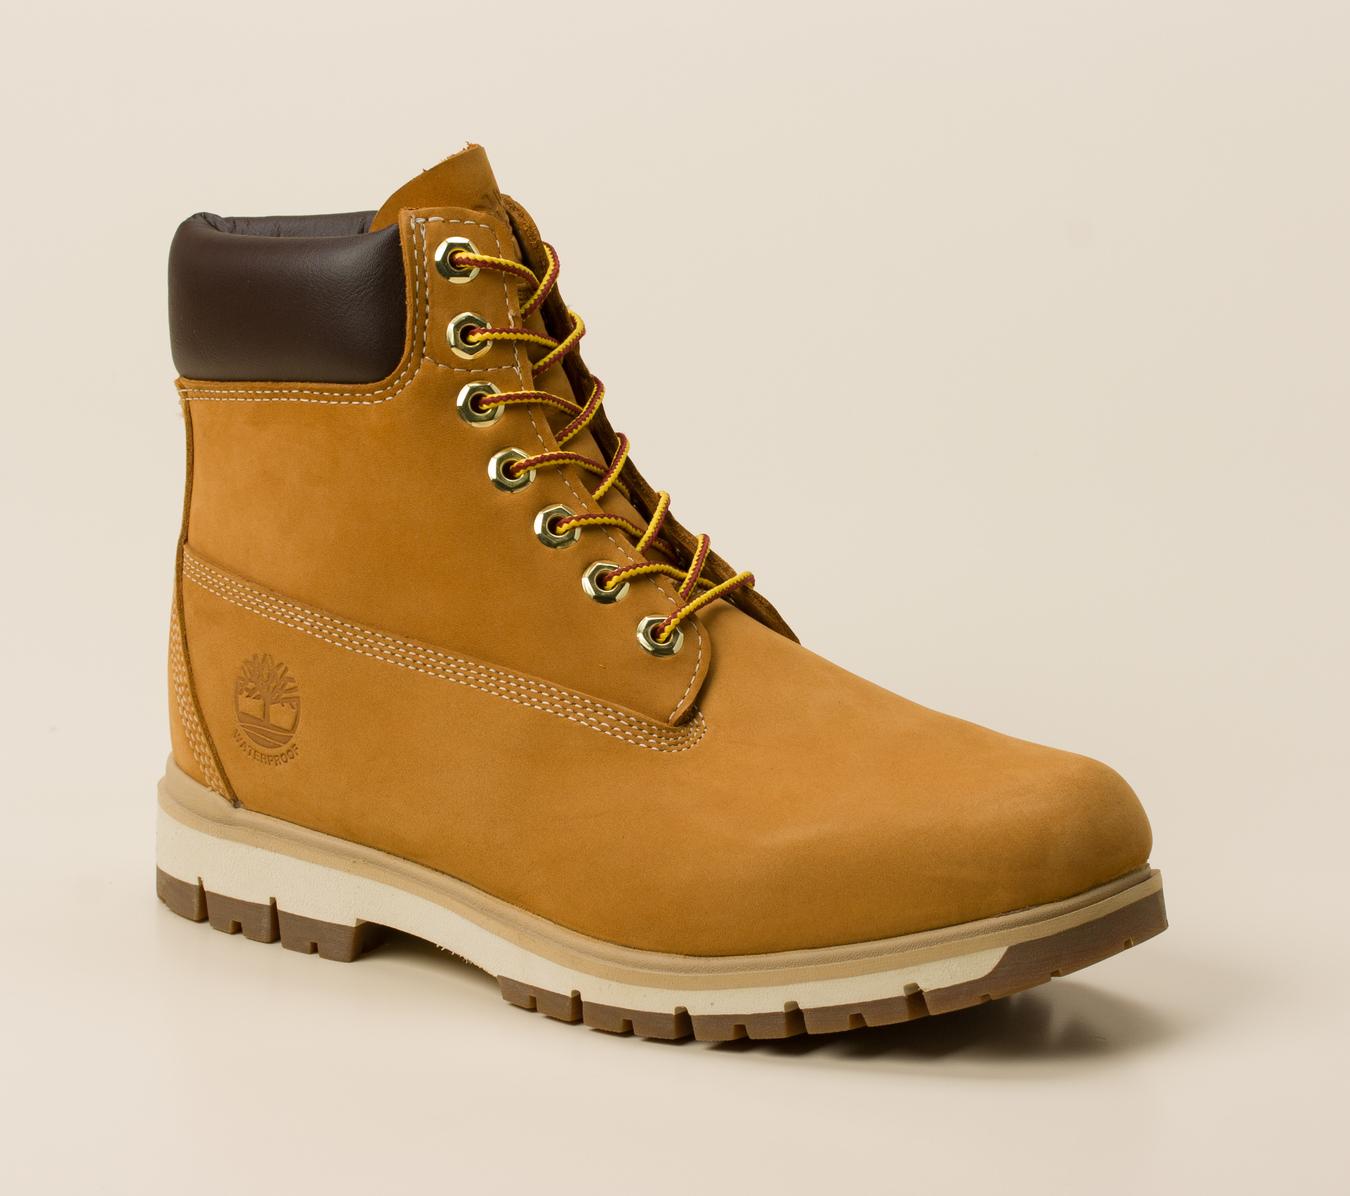 Timberland Herrenbeschuhe | Kaufen Sie Timberland Schuhe